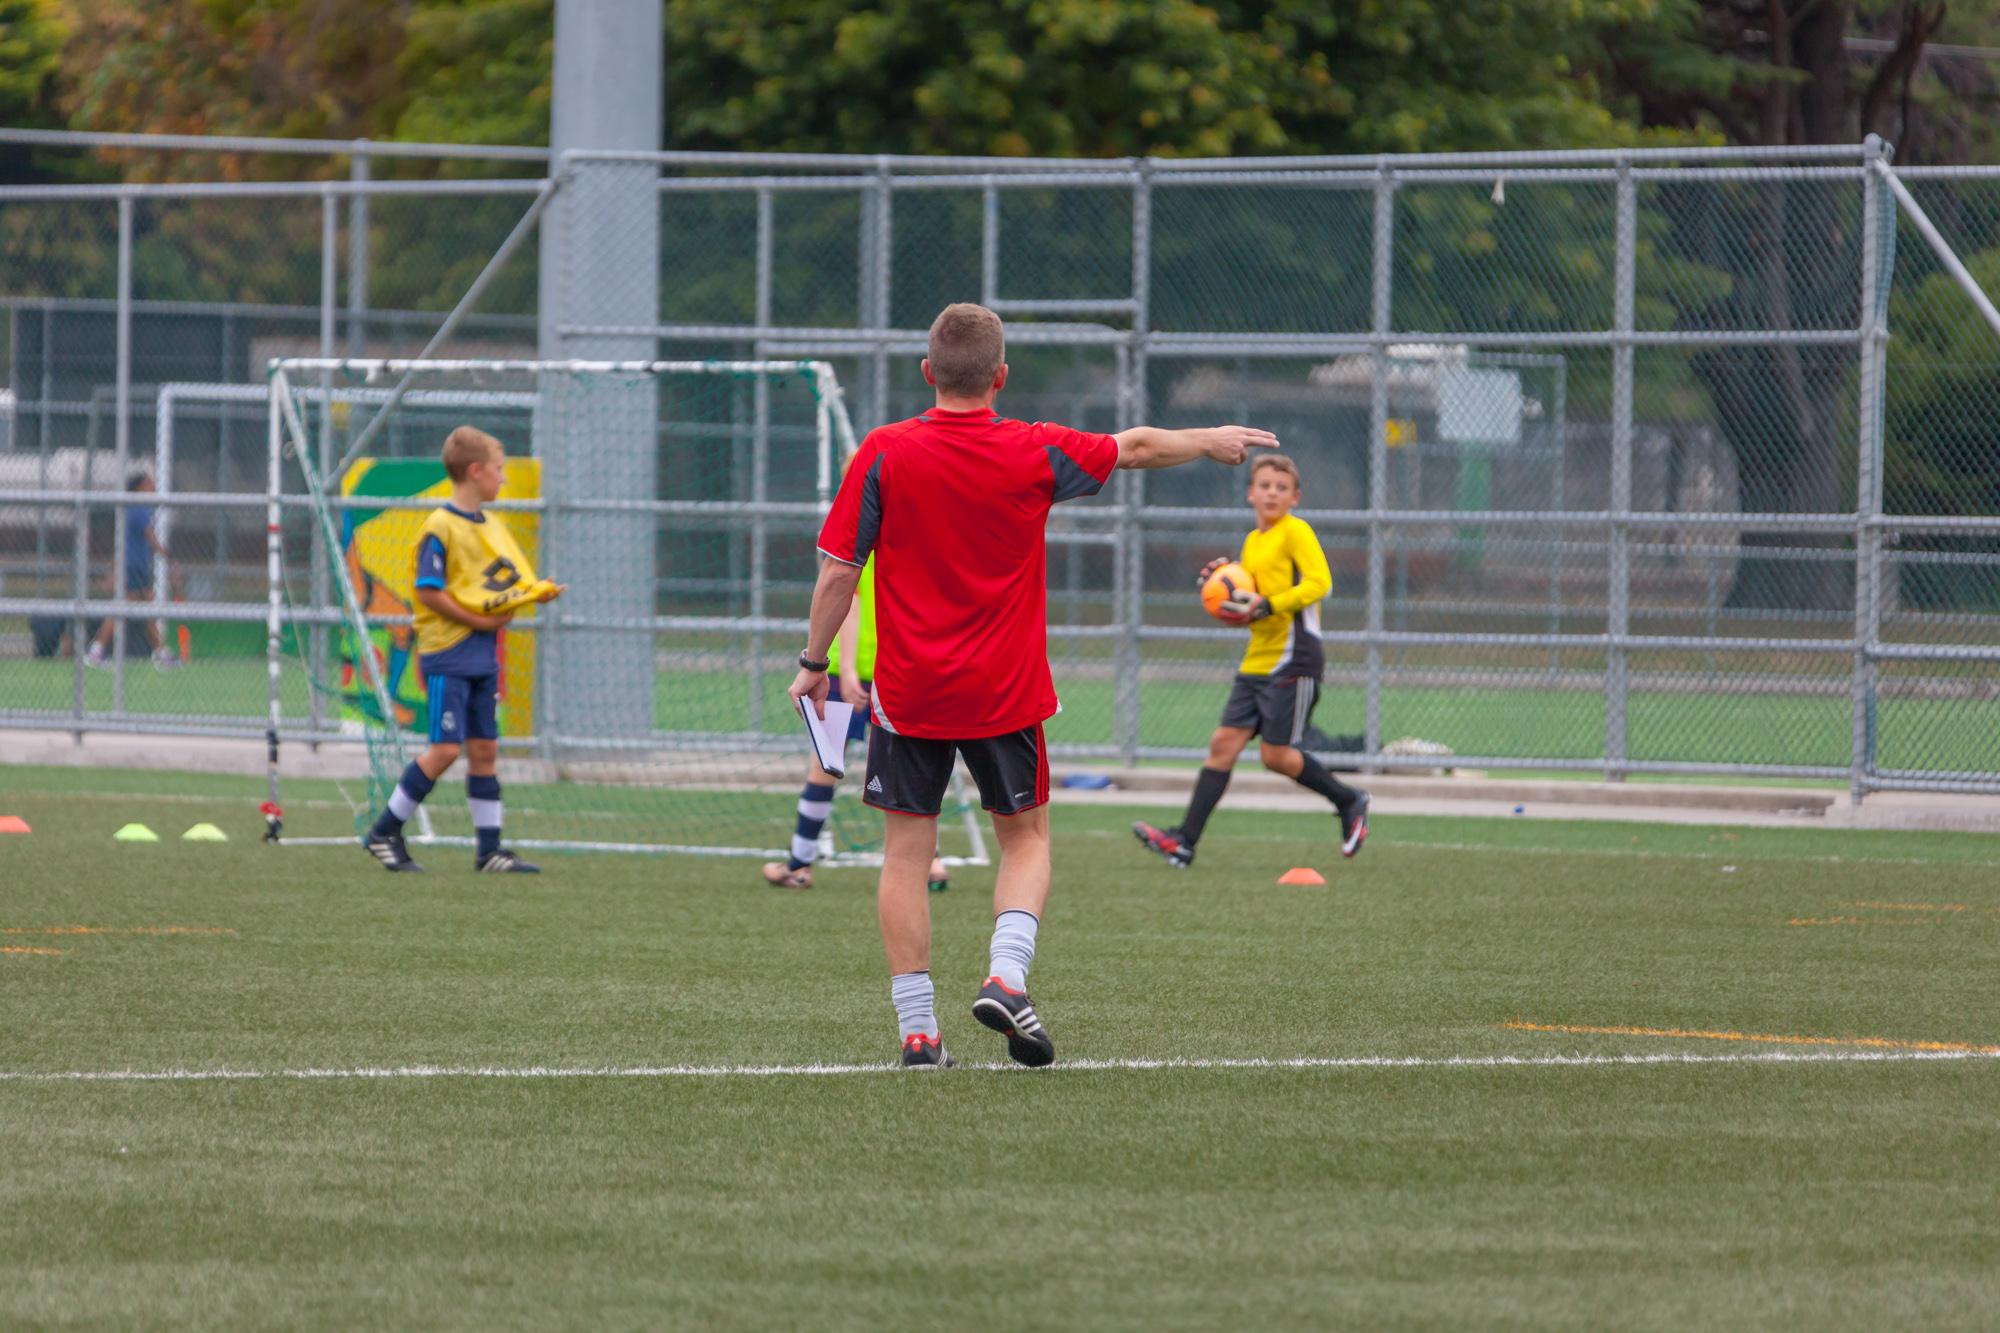 UHCC Soccer Coach 4418